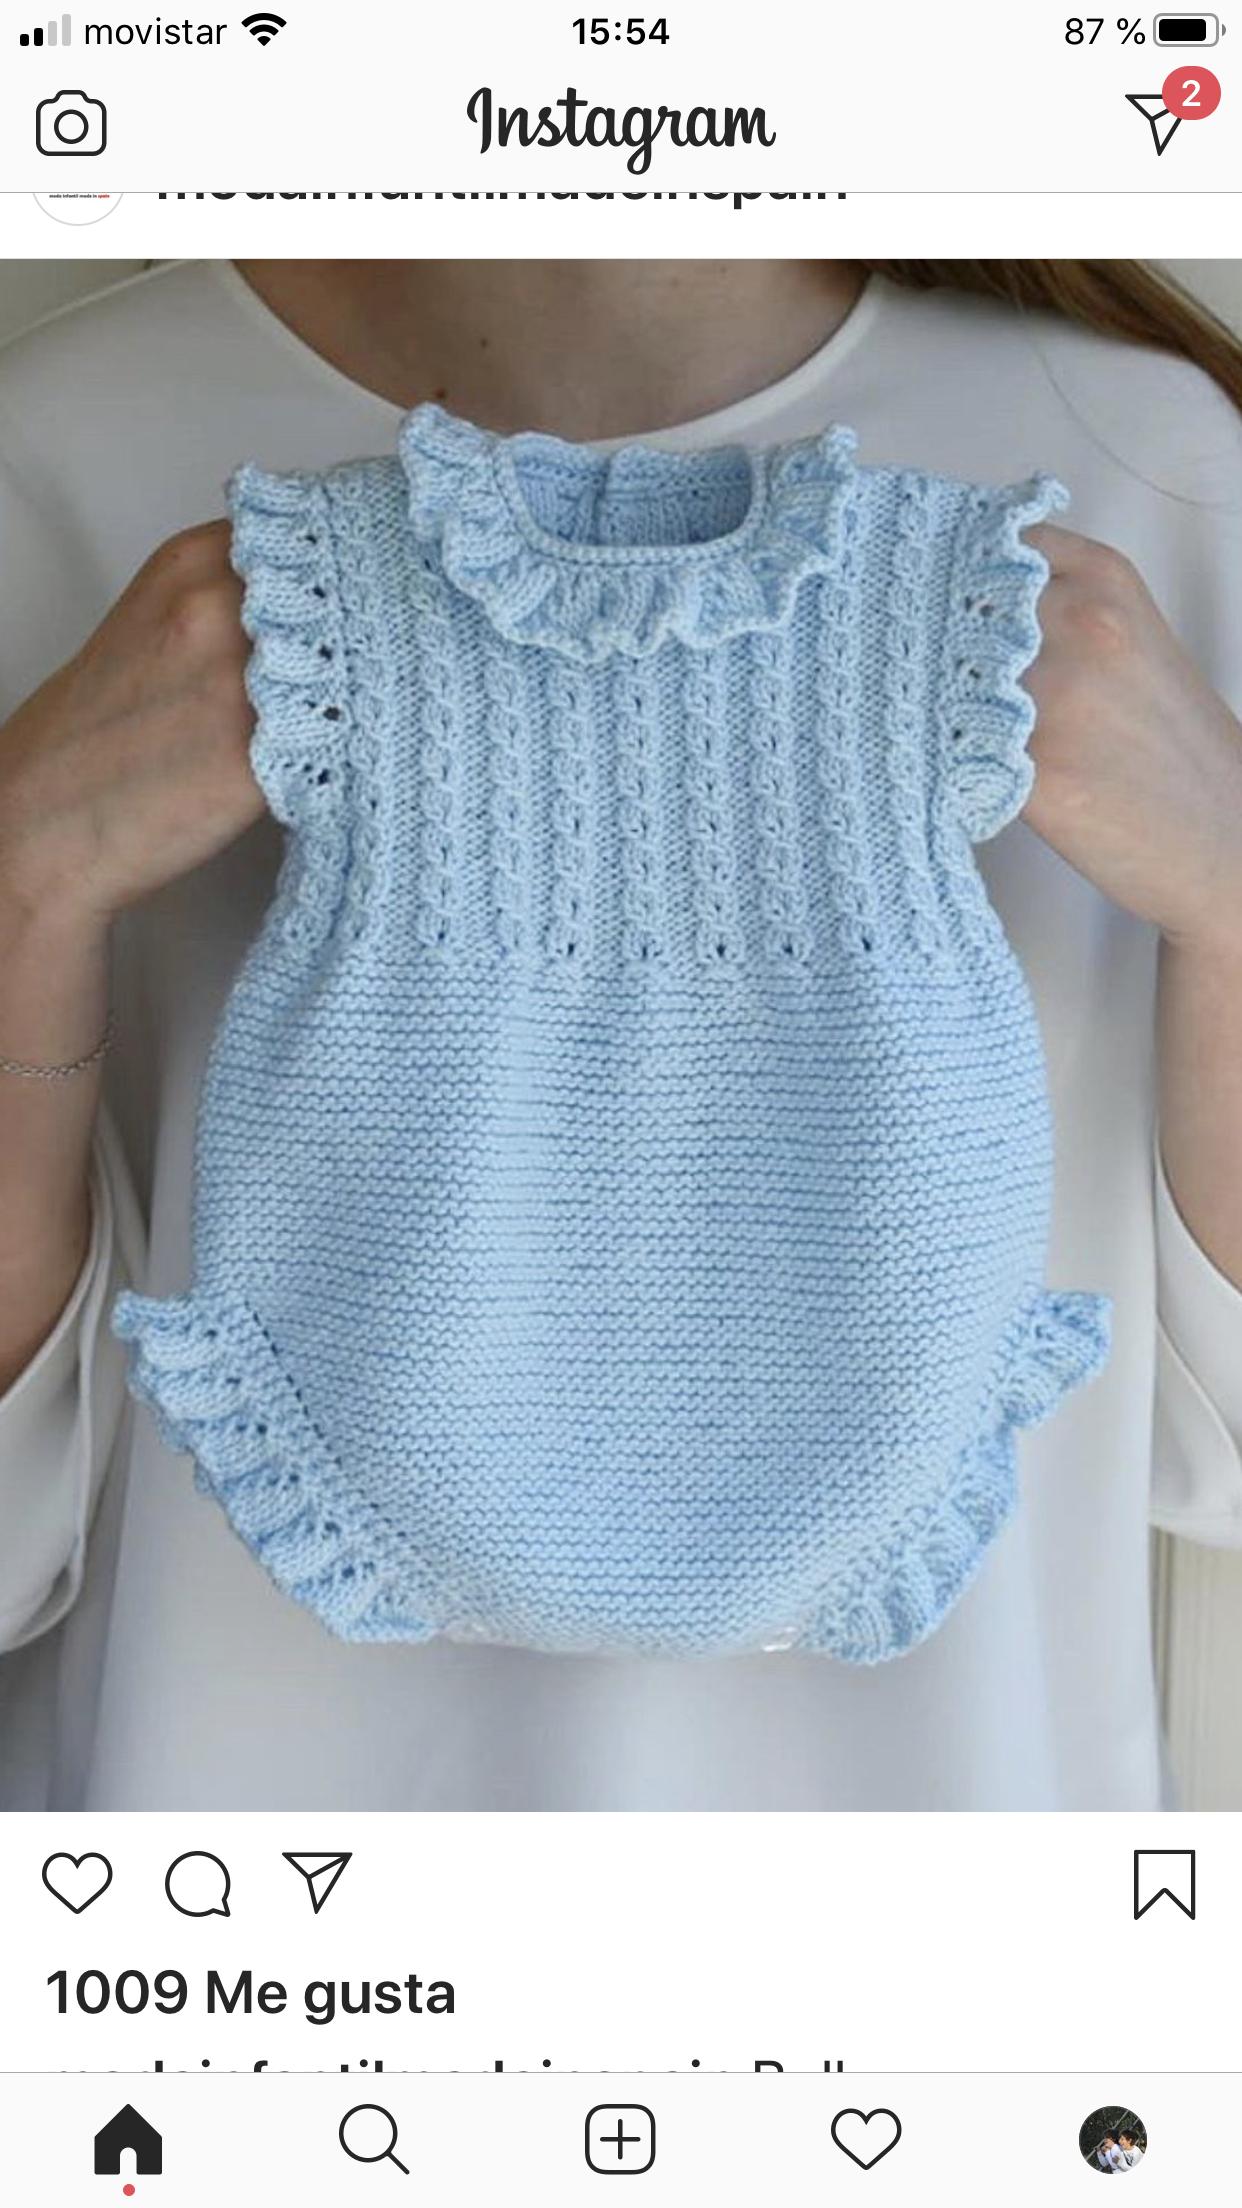 Maria Silva Adli Kullanicinin Prendas De Punto De Bebes Panosundaki Pin 2020 Baby Knitting Patterns Bebek Elbise Ogreticileri Krose